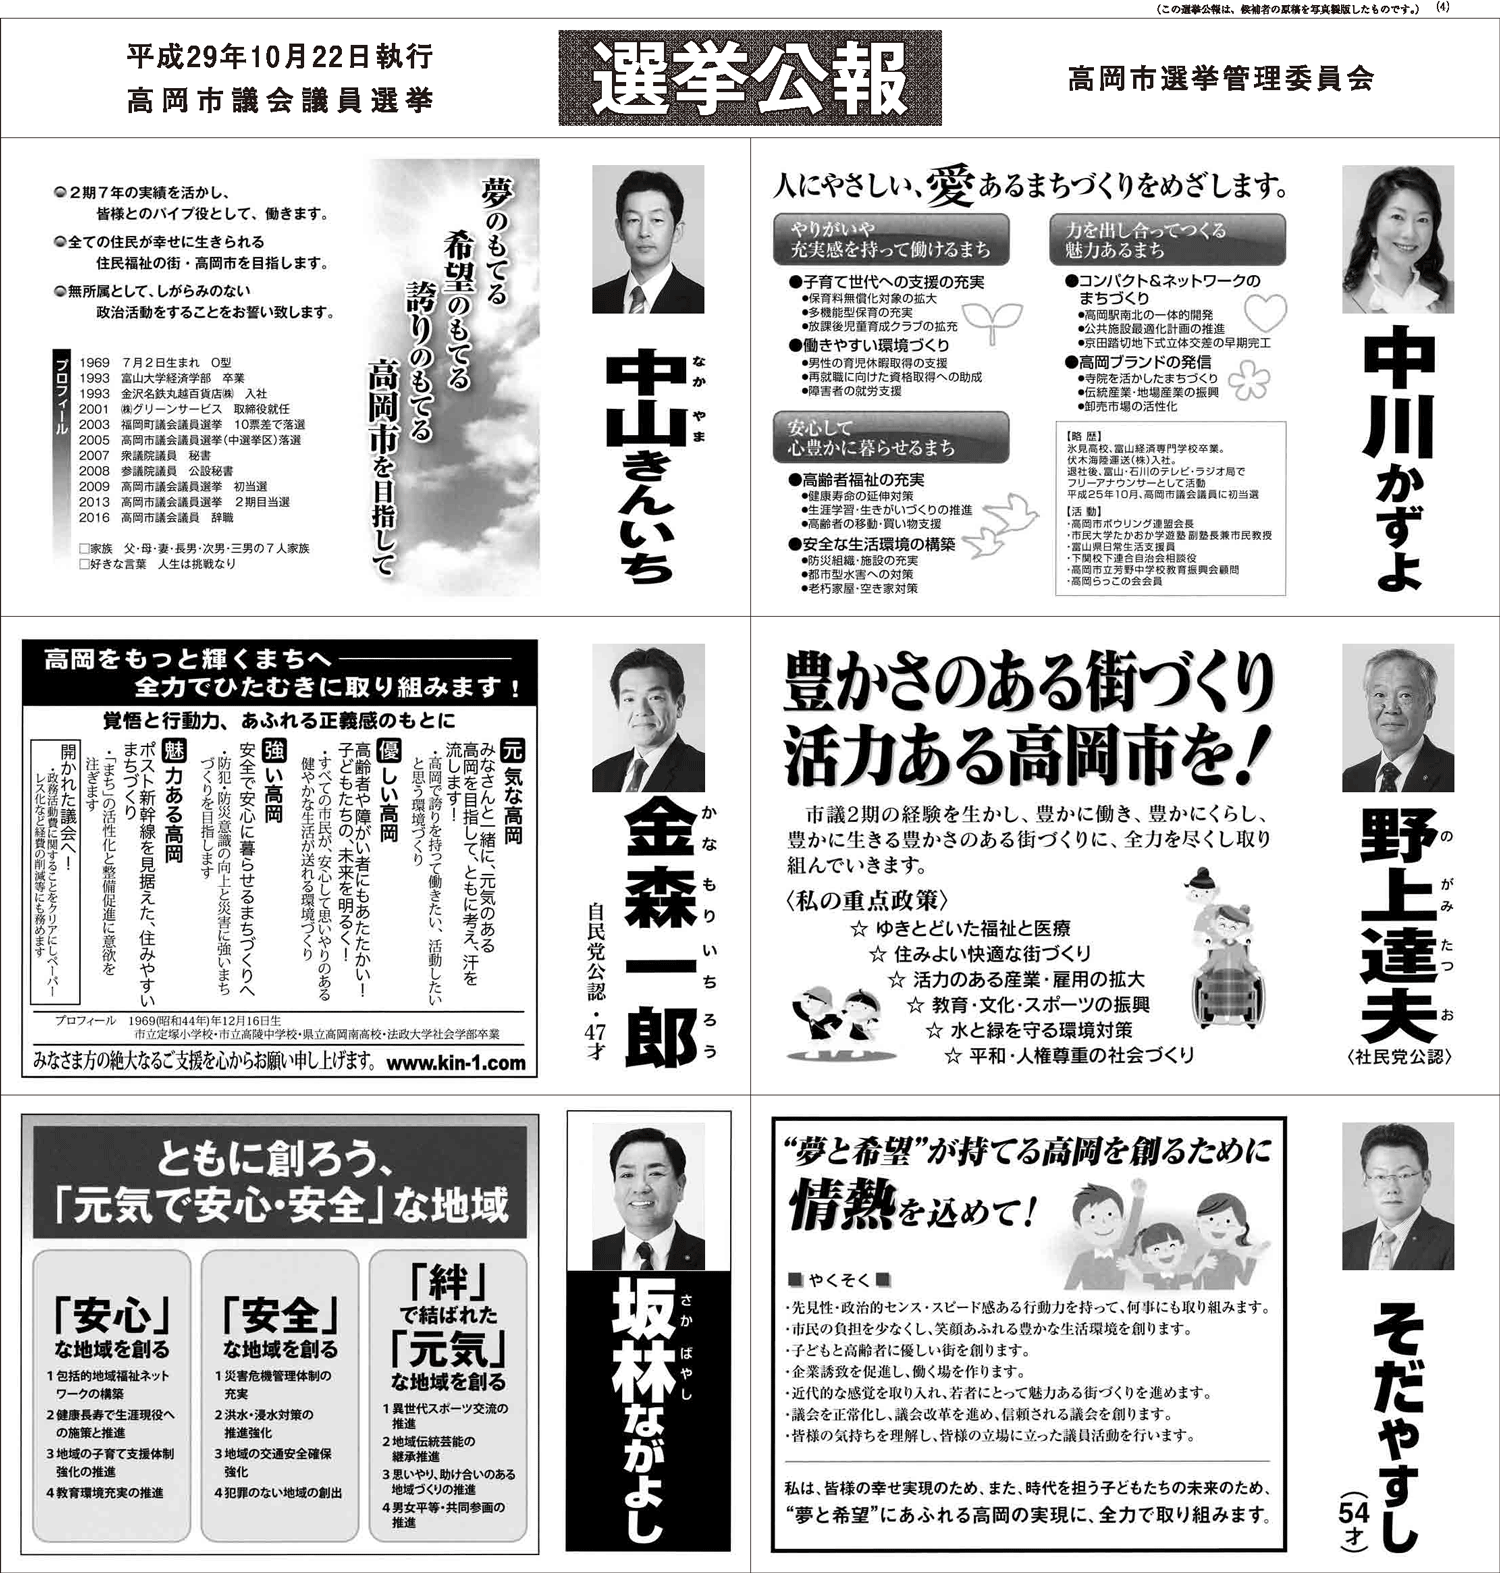 高岡市議会議員選挙2017の選挙公報4